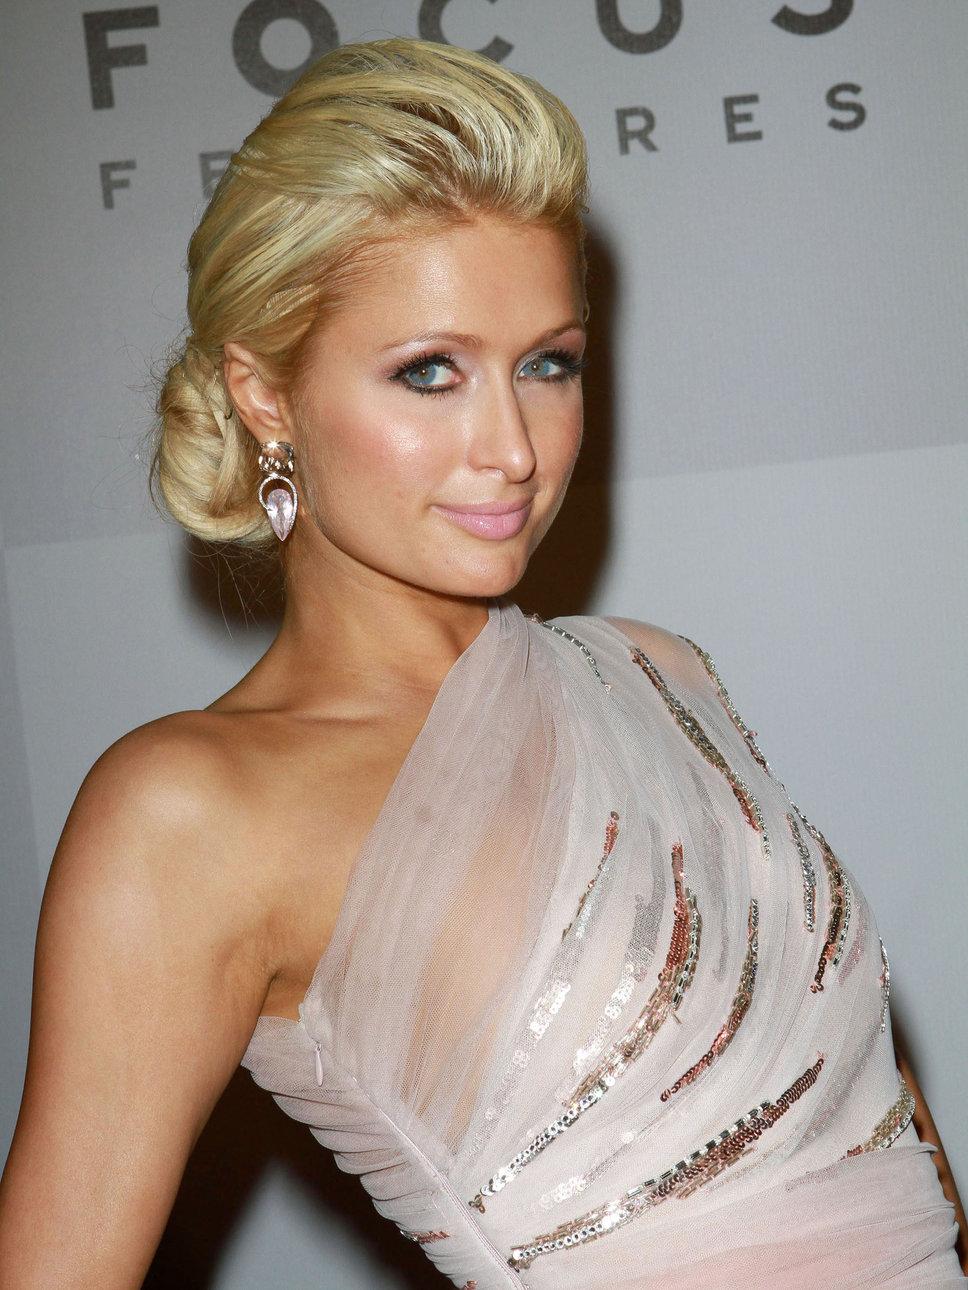 Hairstyles Vintage Paris Hilton Hairstyles